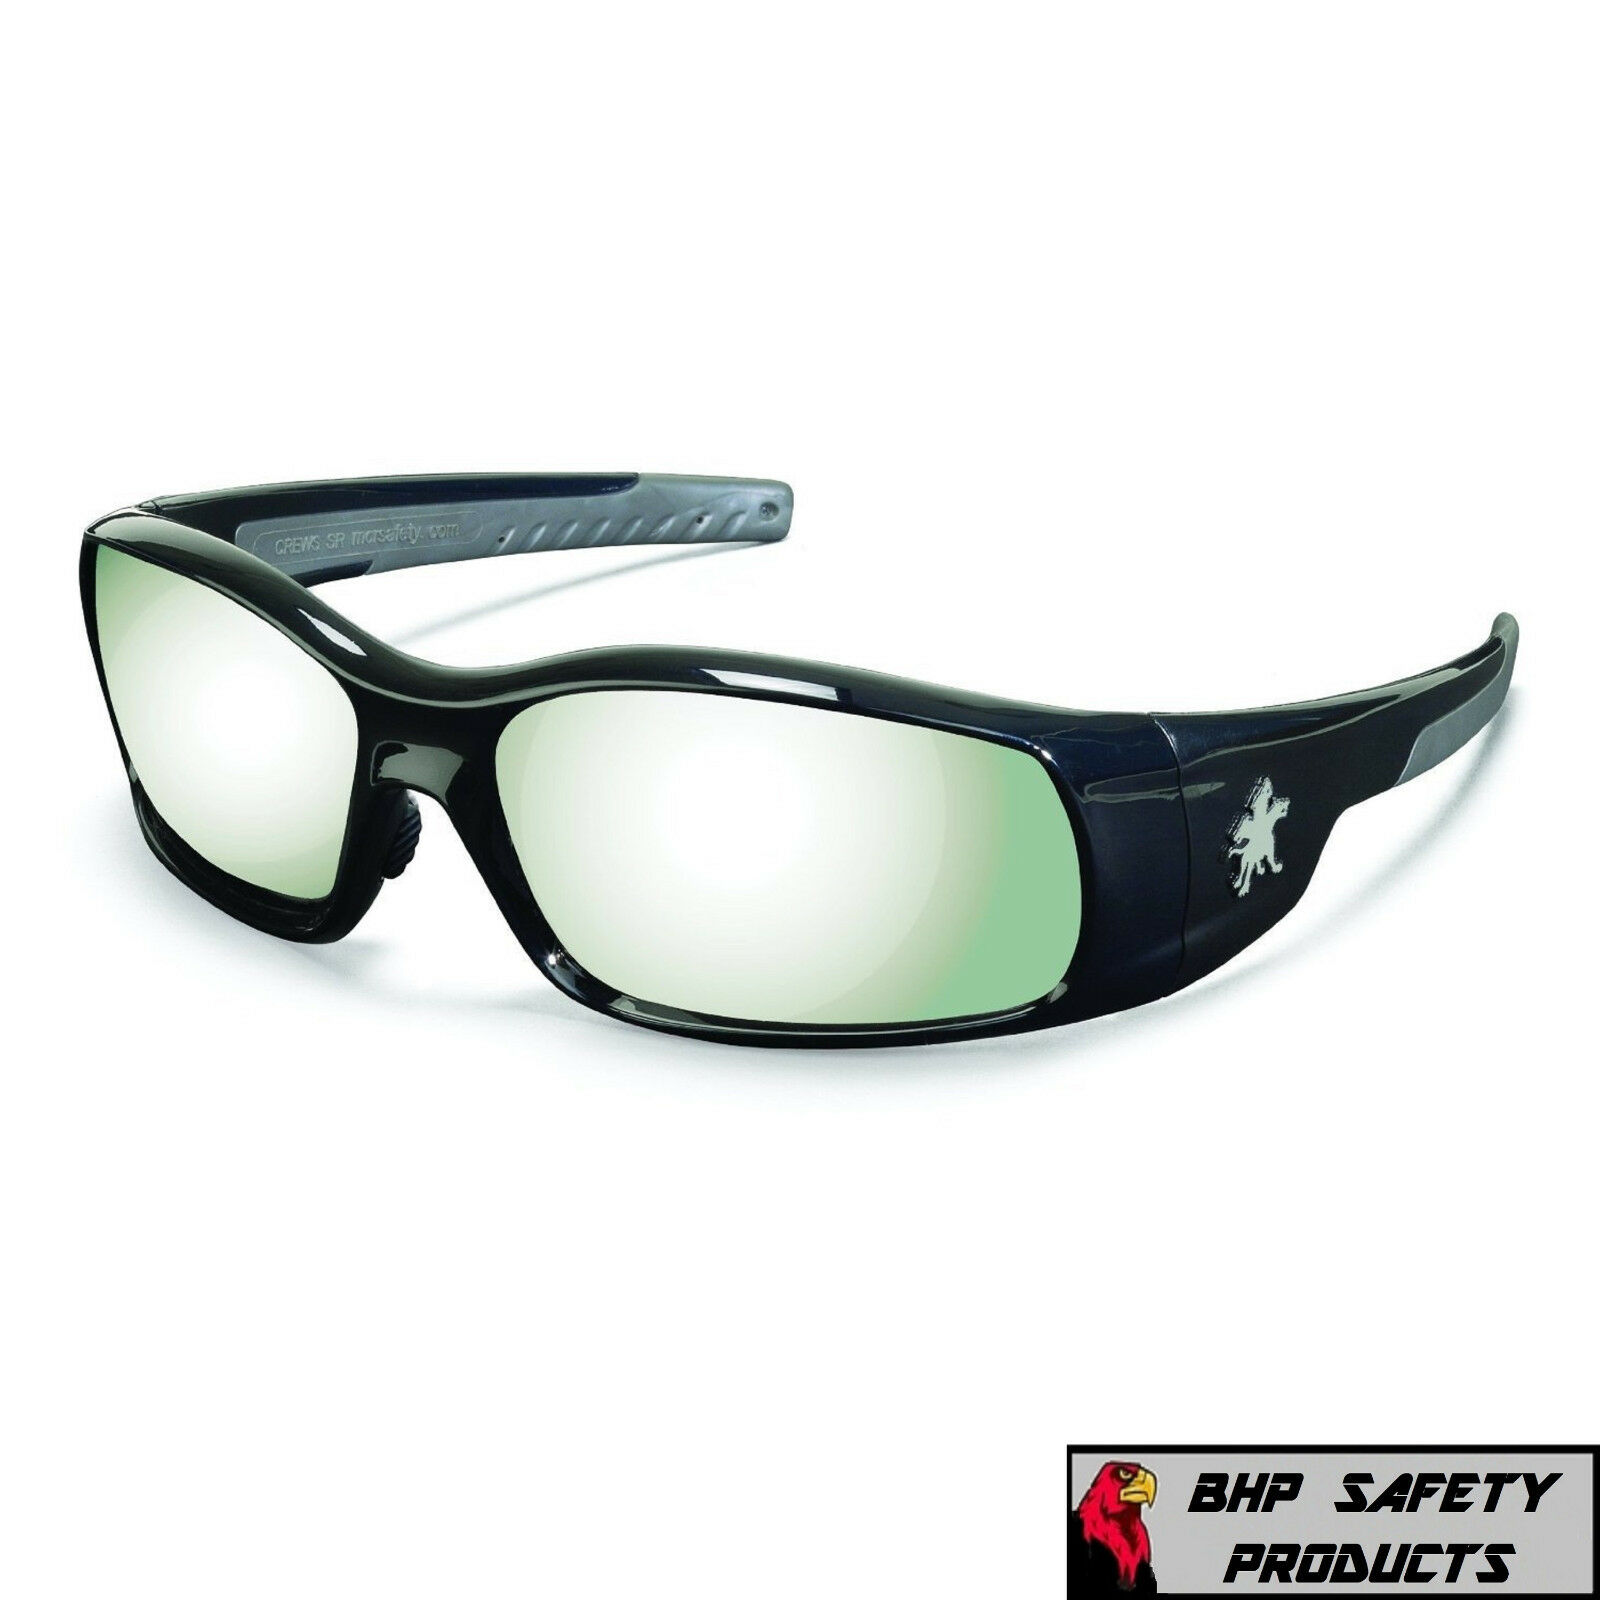 MCR CREWS SWAGGER SAFETY GLASSES SUNGLASSES WORK SPORT EYEWEAR CHOOSE YOUR COLOR SR117 SILVER MIRROR/BLACK FRAME